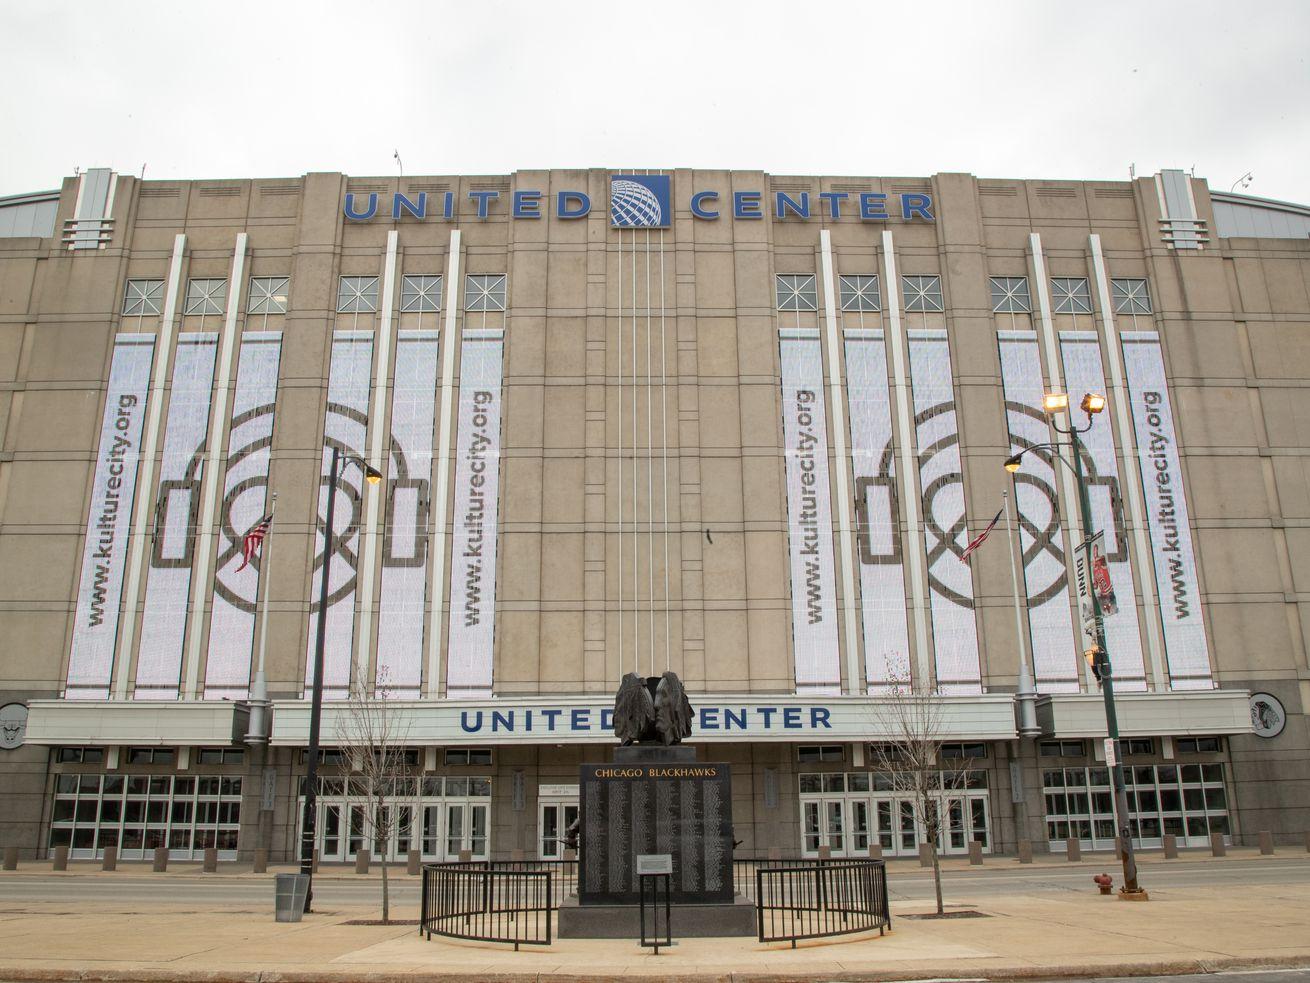 United Center in Chicago